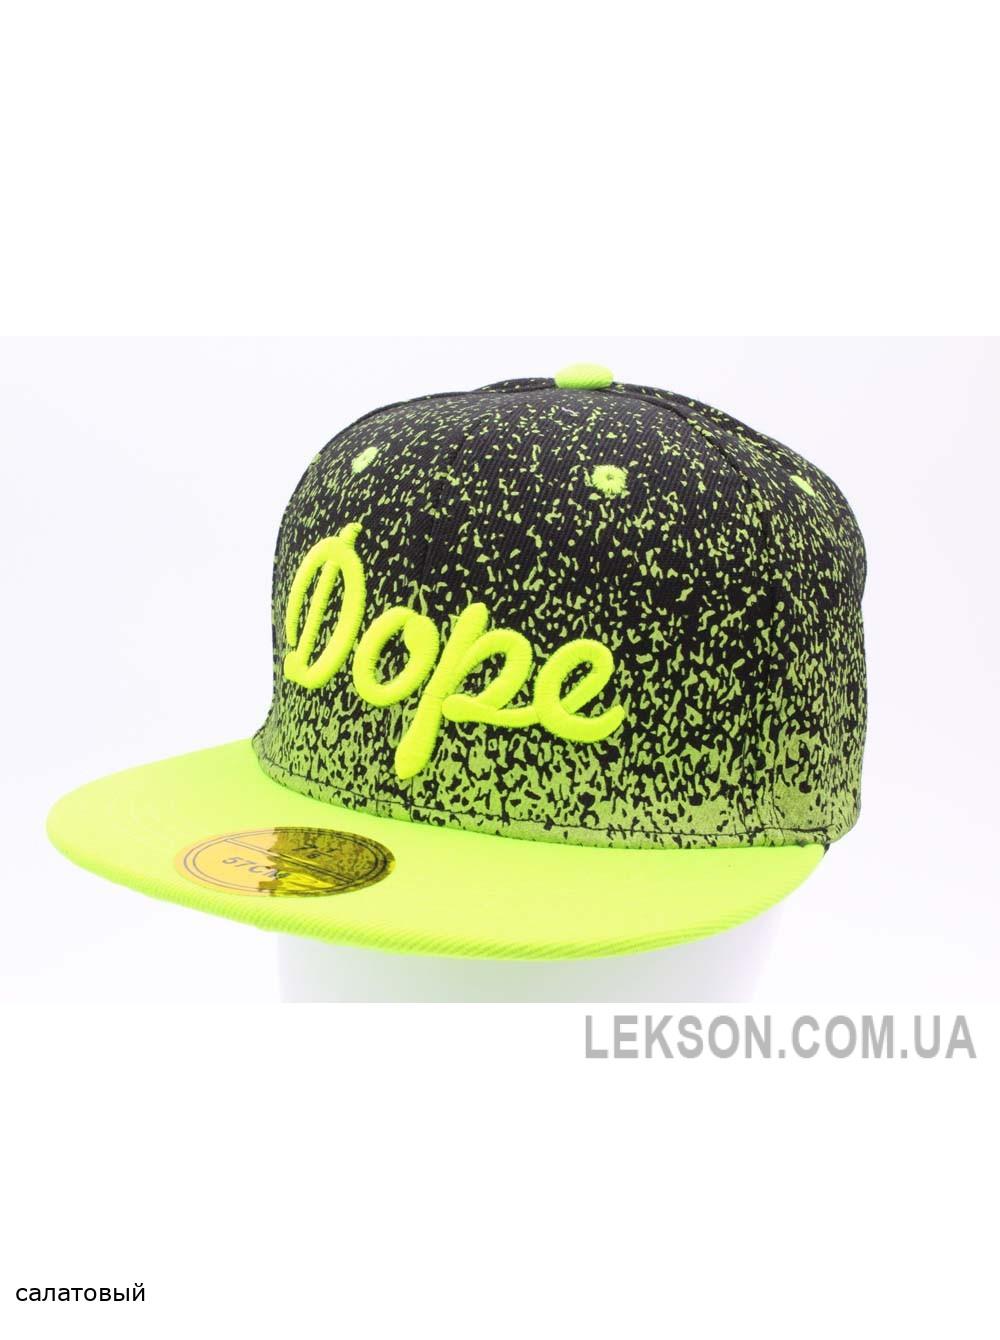 Rap - cc07022-57